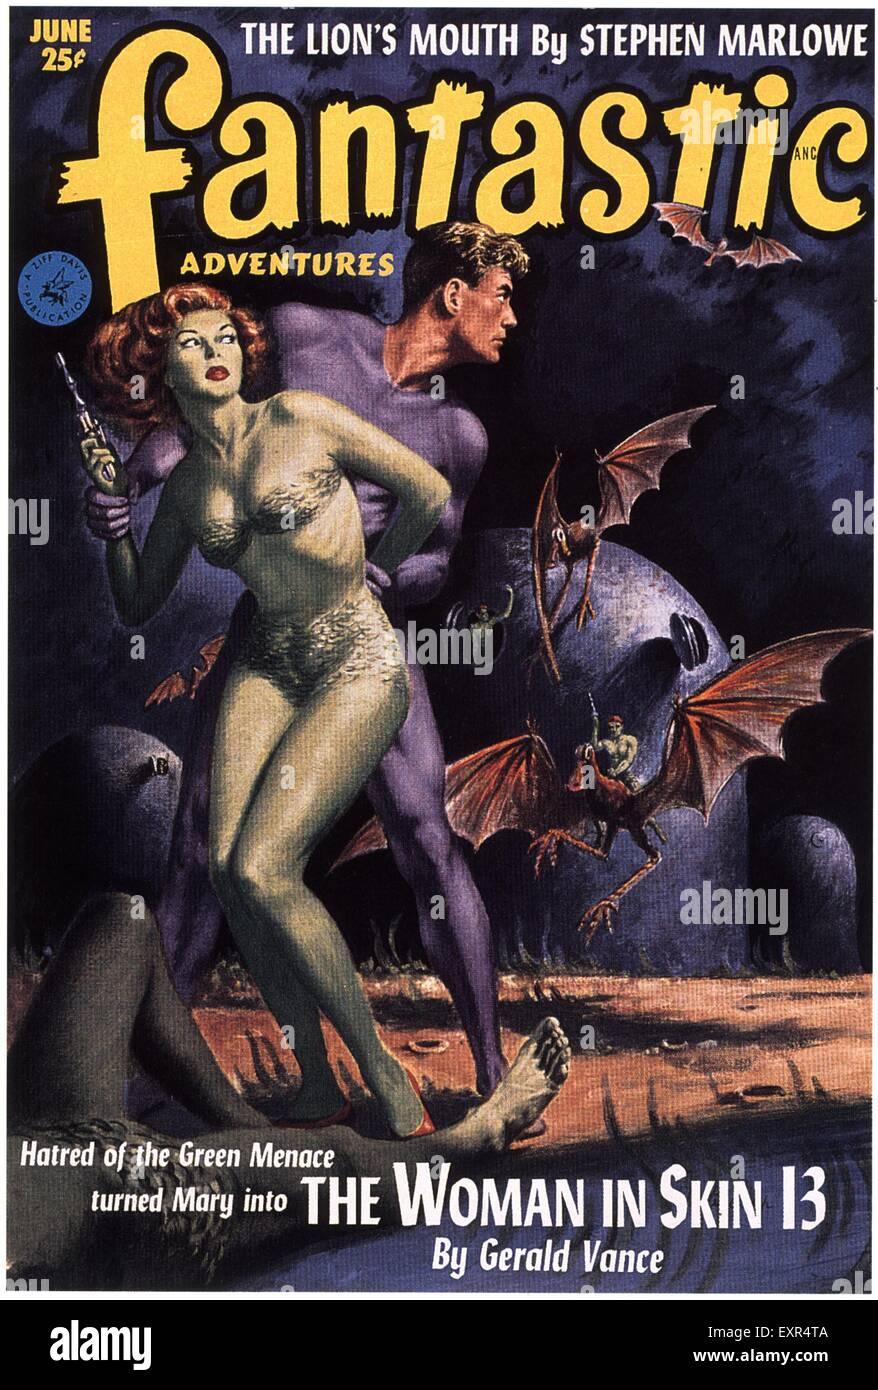 1950s USA Fantastic Adventures Magazine Cover - Stock Image